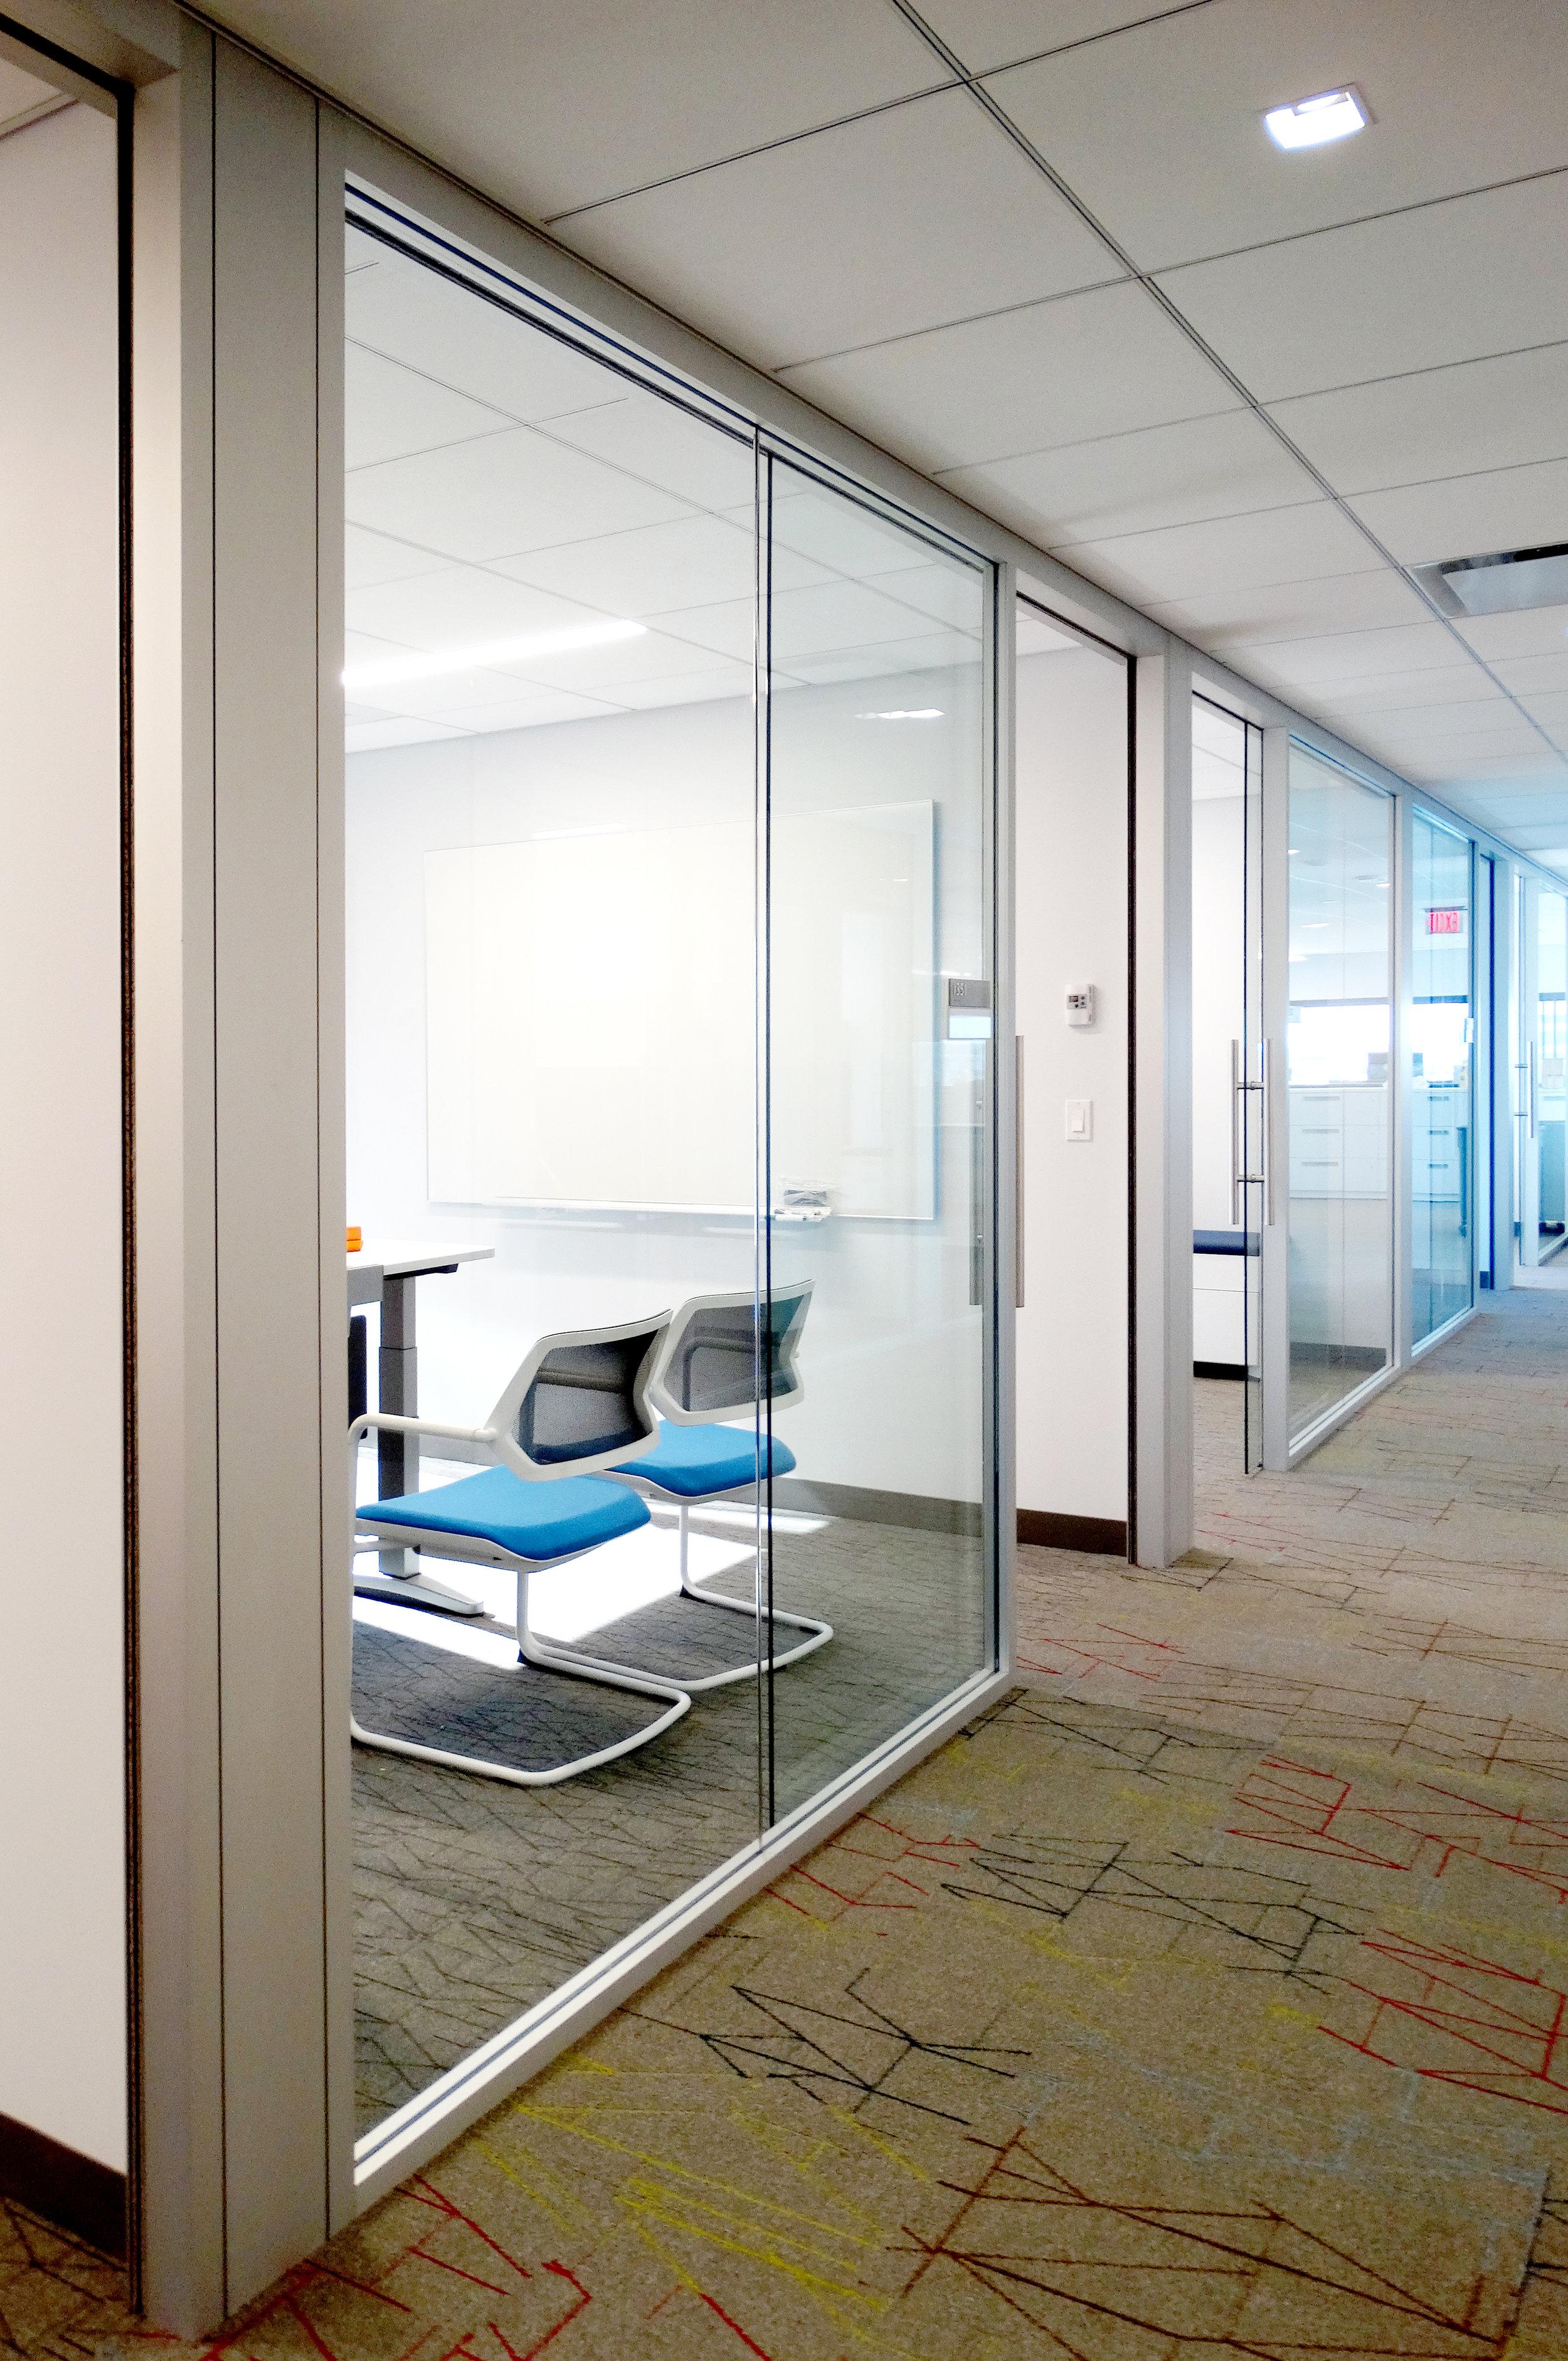 Litespace Demountable Glass Office Walls Sliding Door - Spaceworks AI.jpg